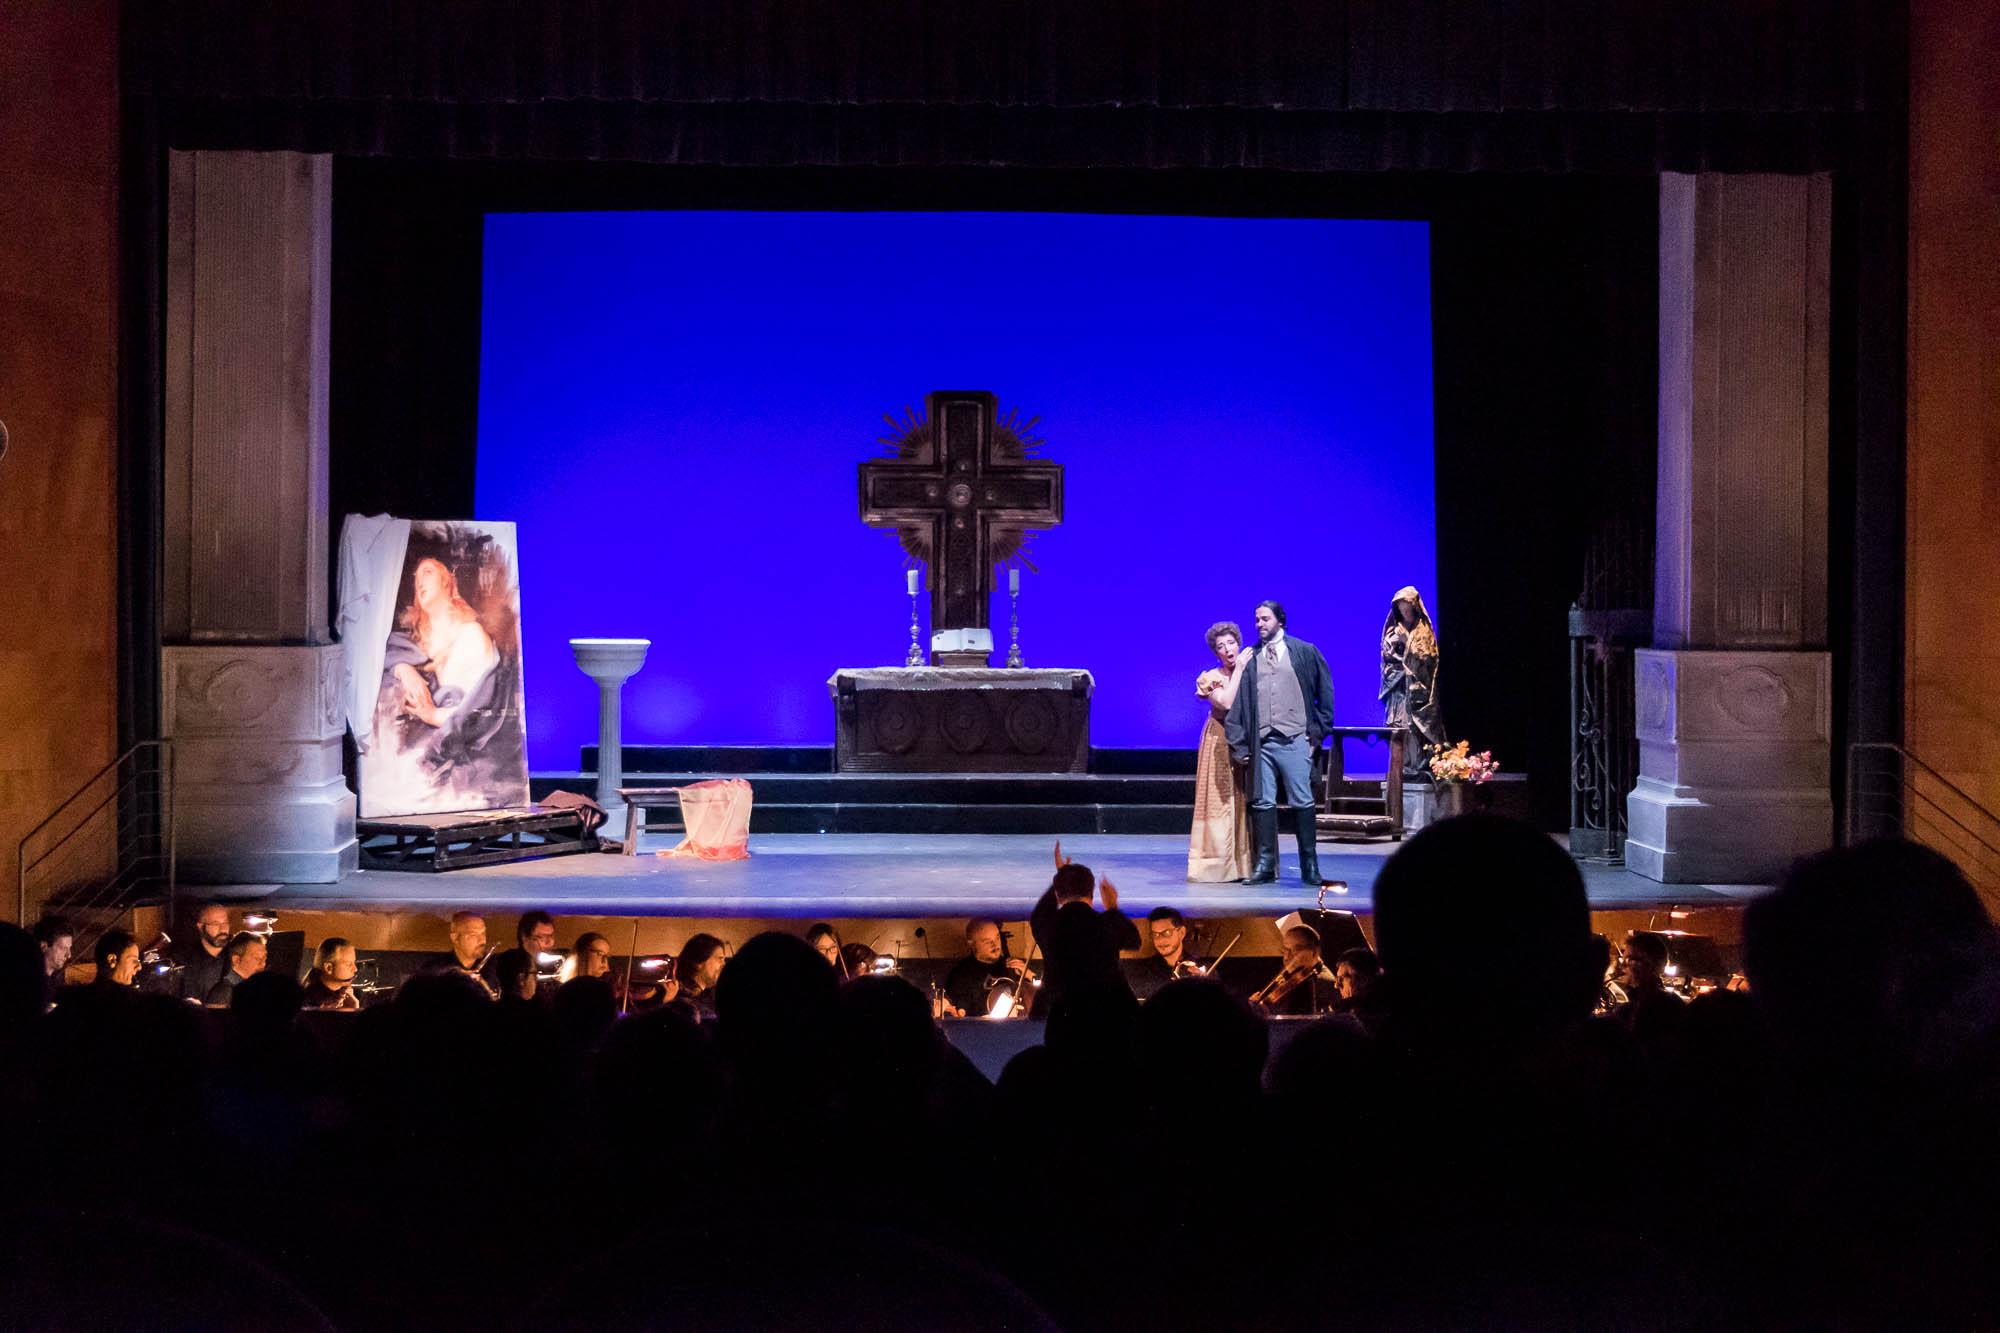 11 novembre: Opera lirica TOSCA